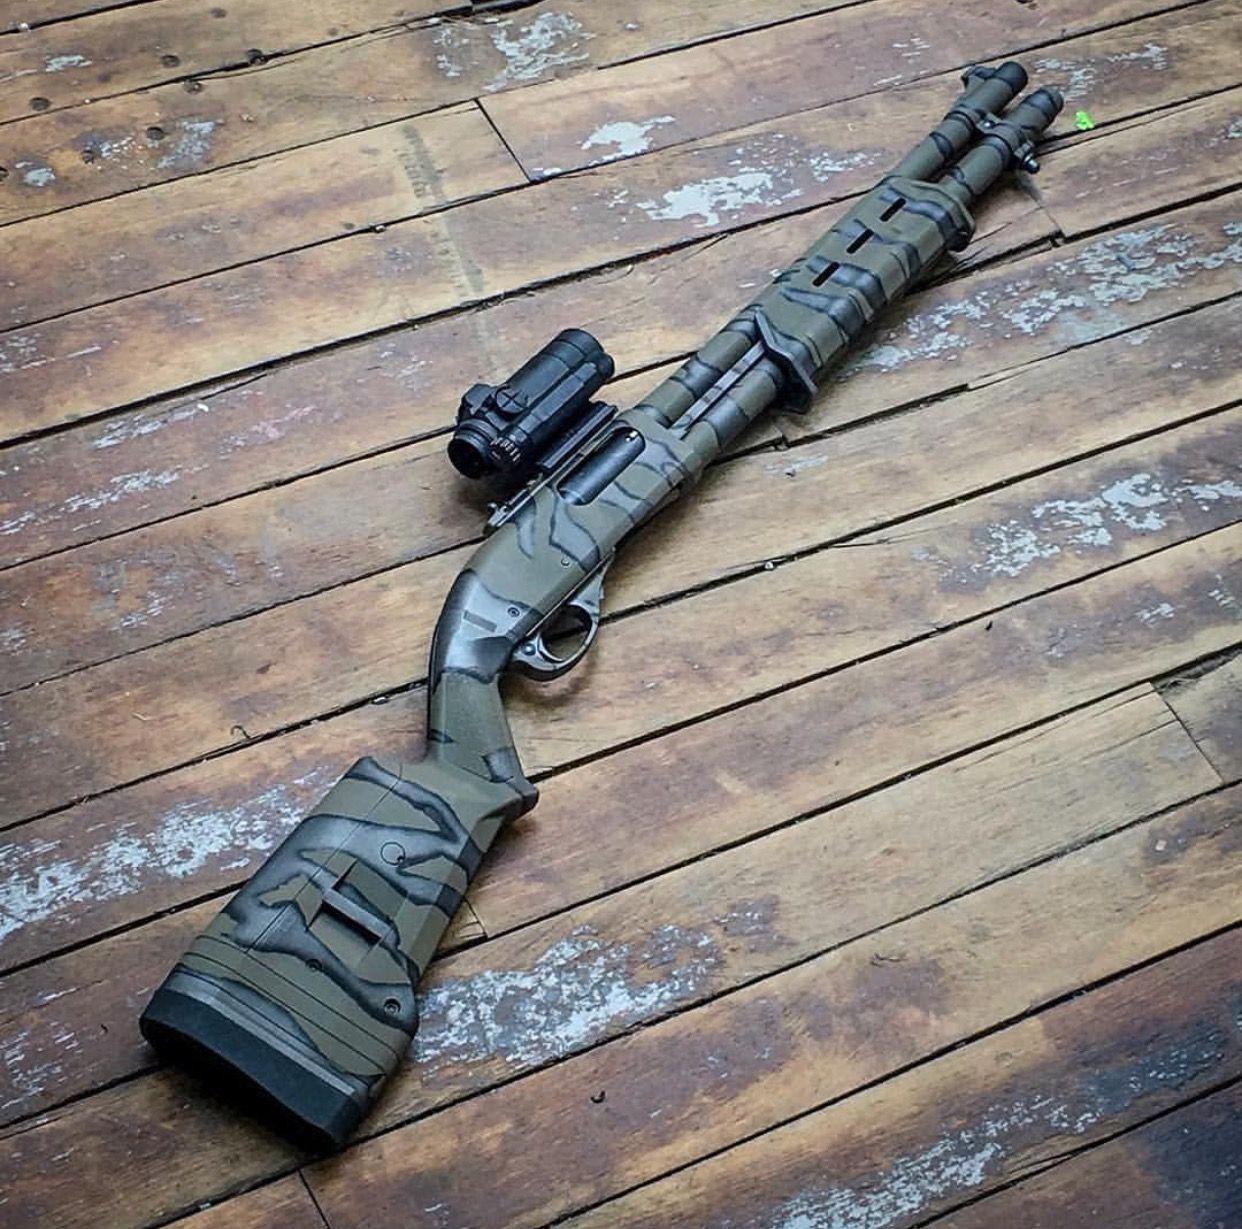 Cool paint job escopetas armas de fuego armas